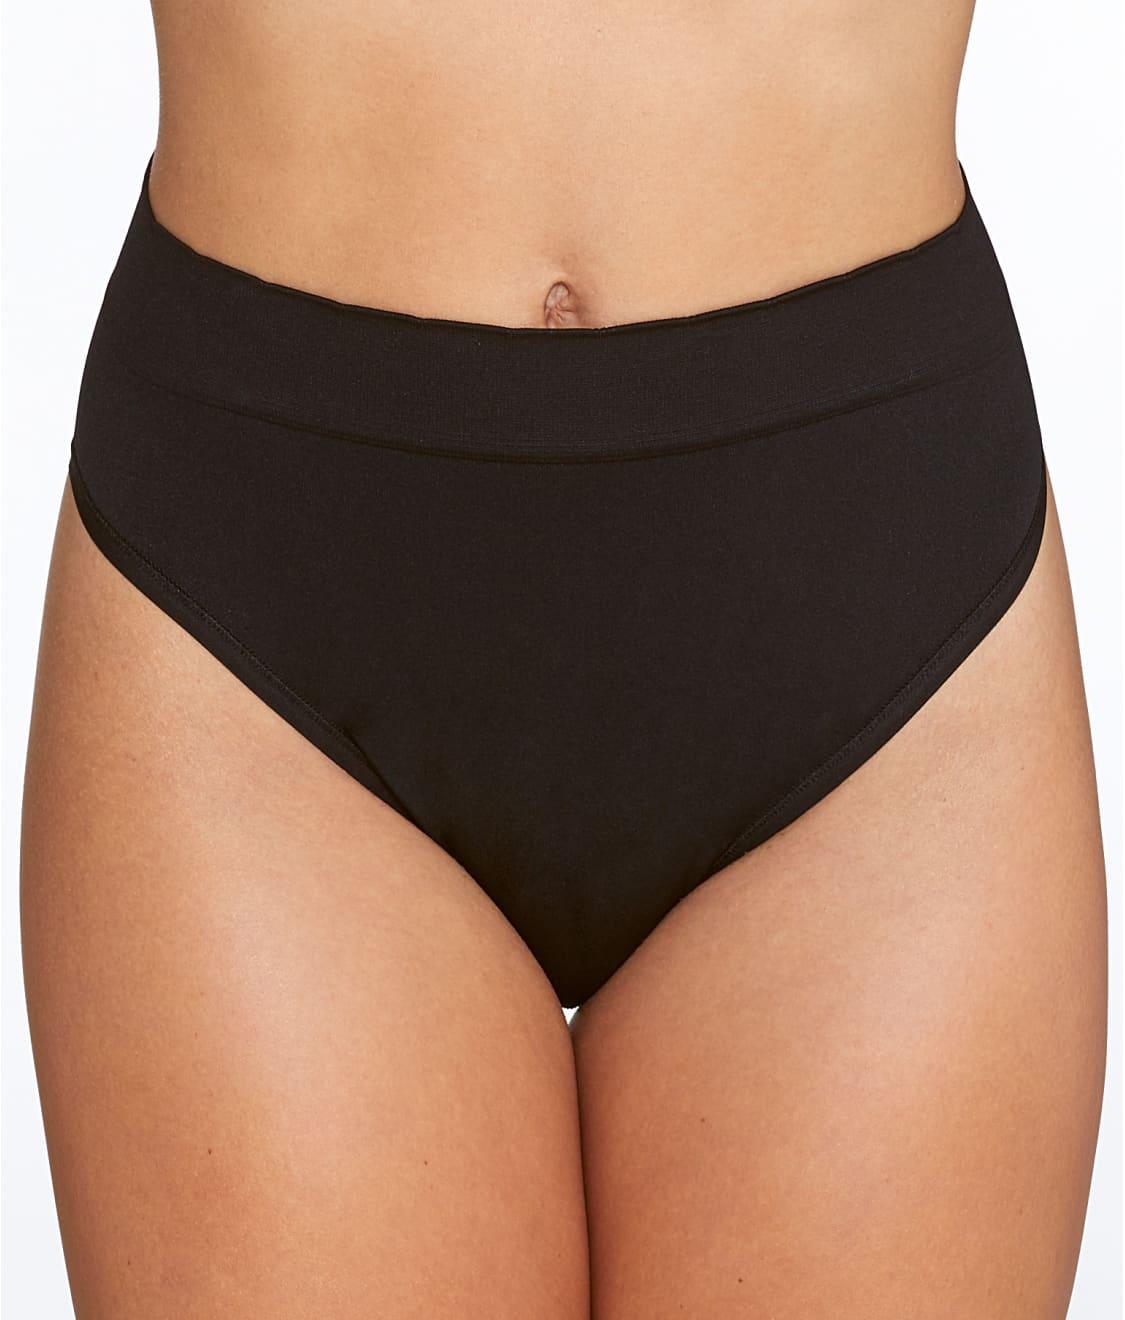 a4f6bb94993a Plus Size Nylon Hi Cut Panties